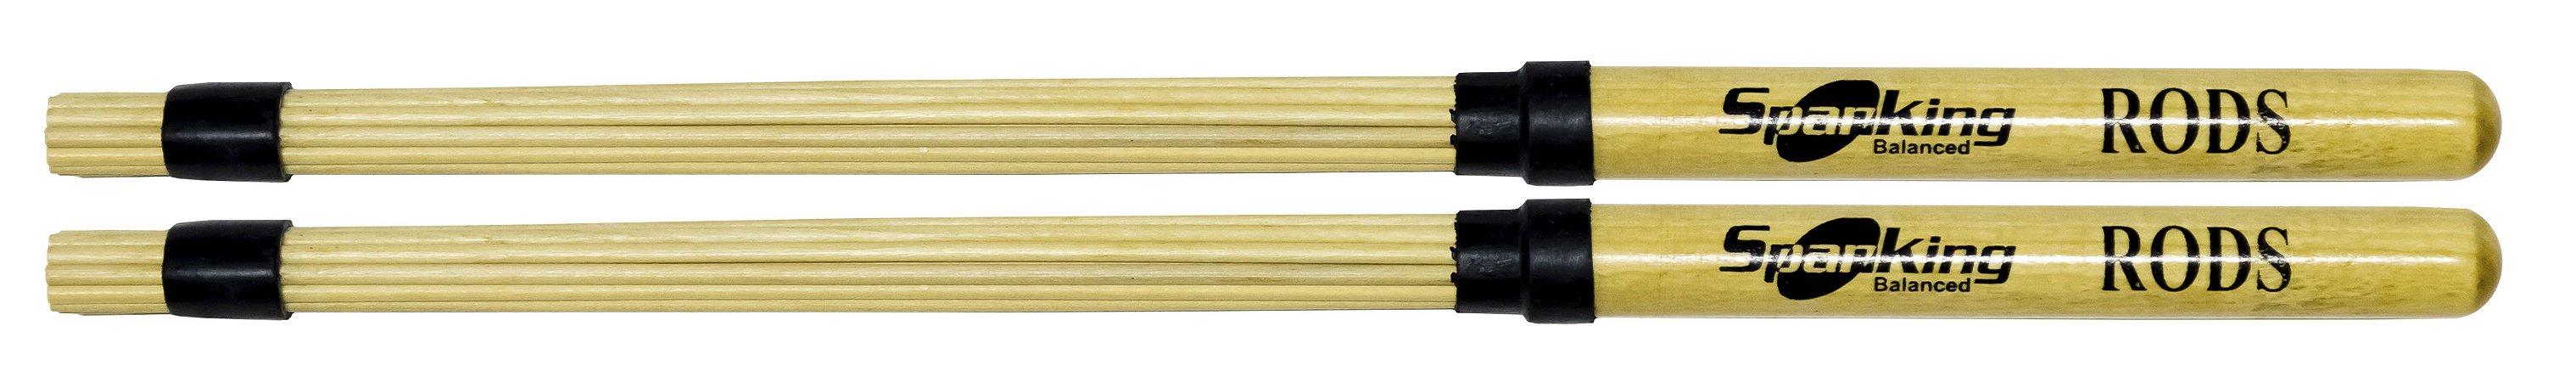 Baqueta Rods Natural Spanking